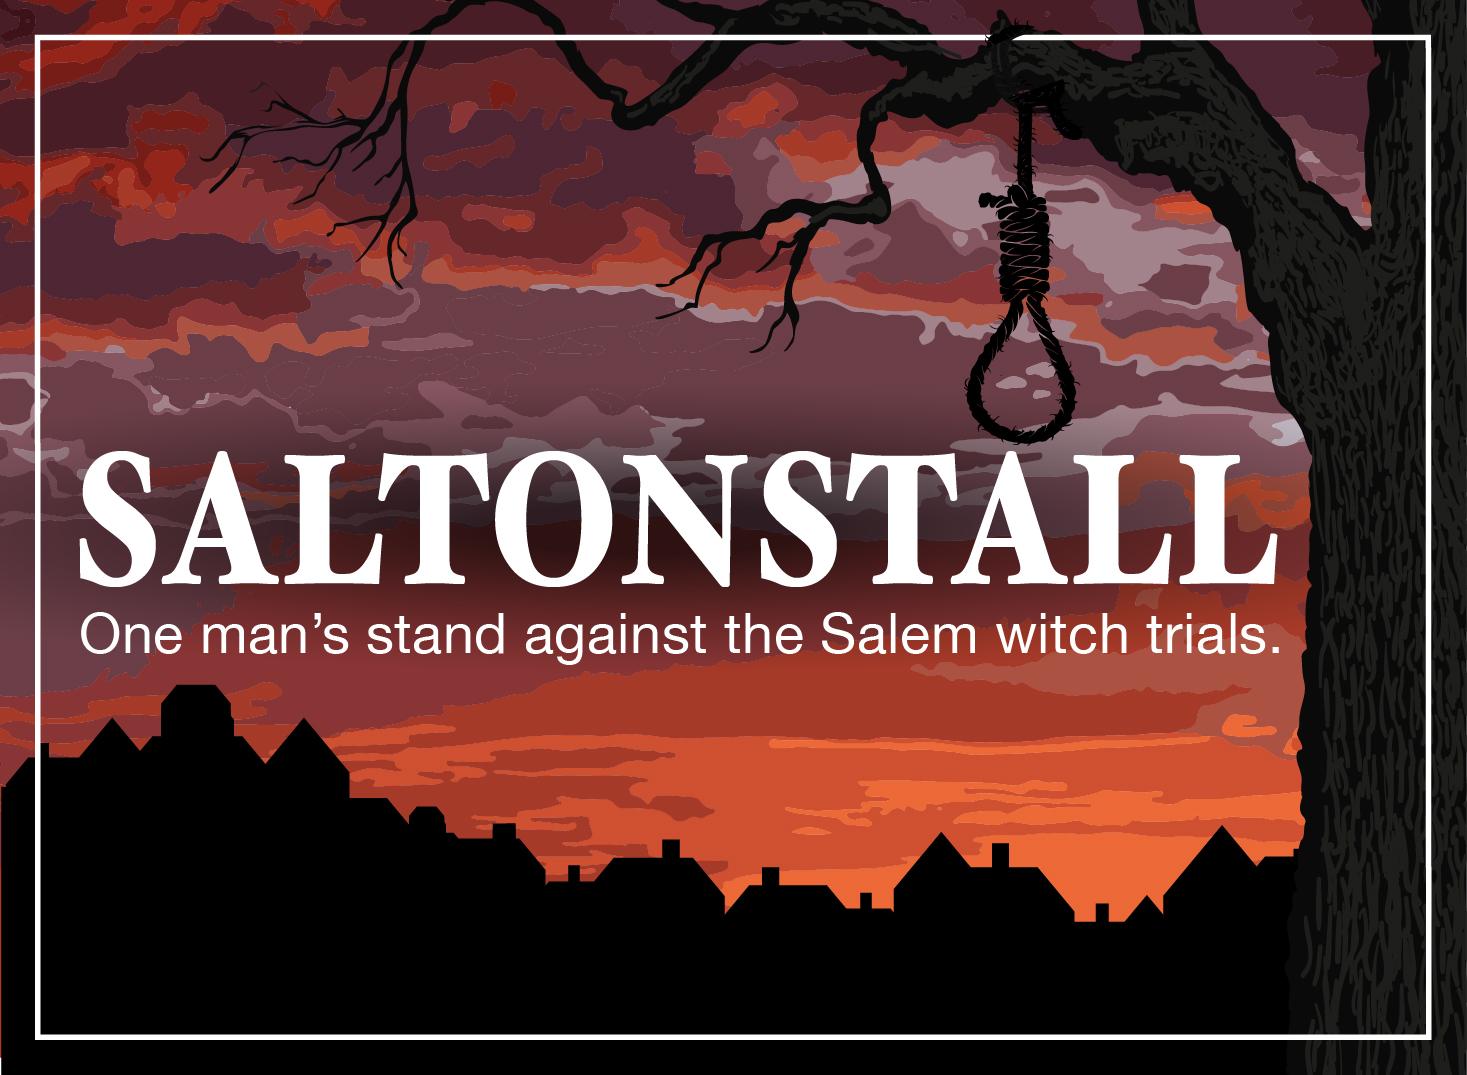 2018-Saltonstall-352x258-01.jpg